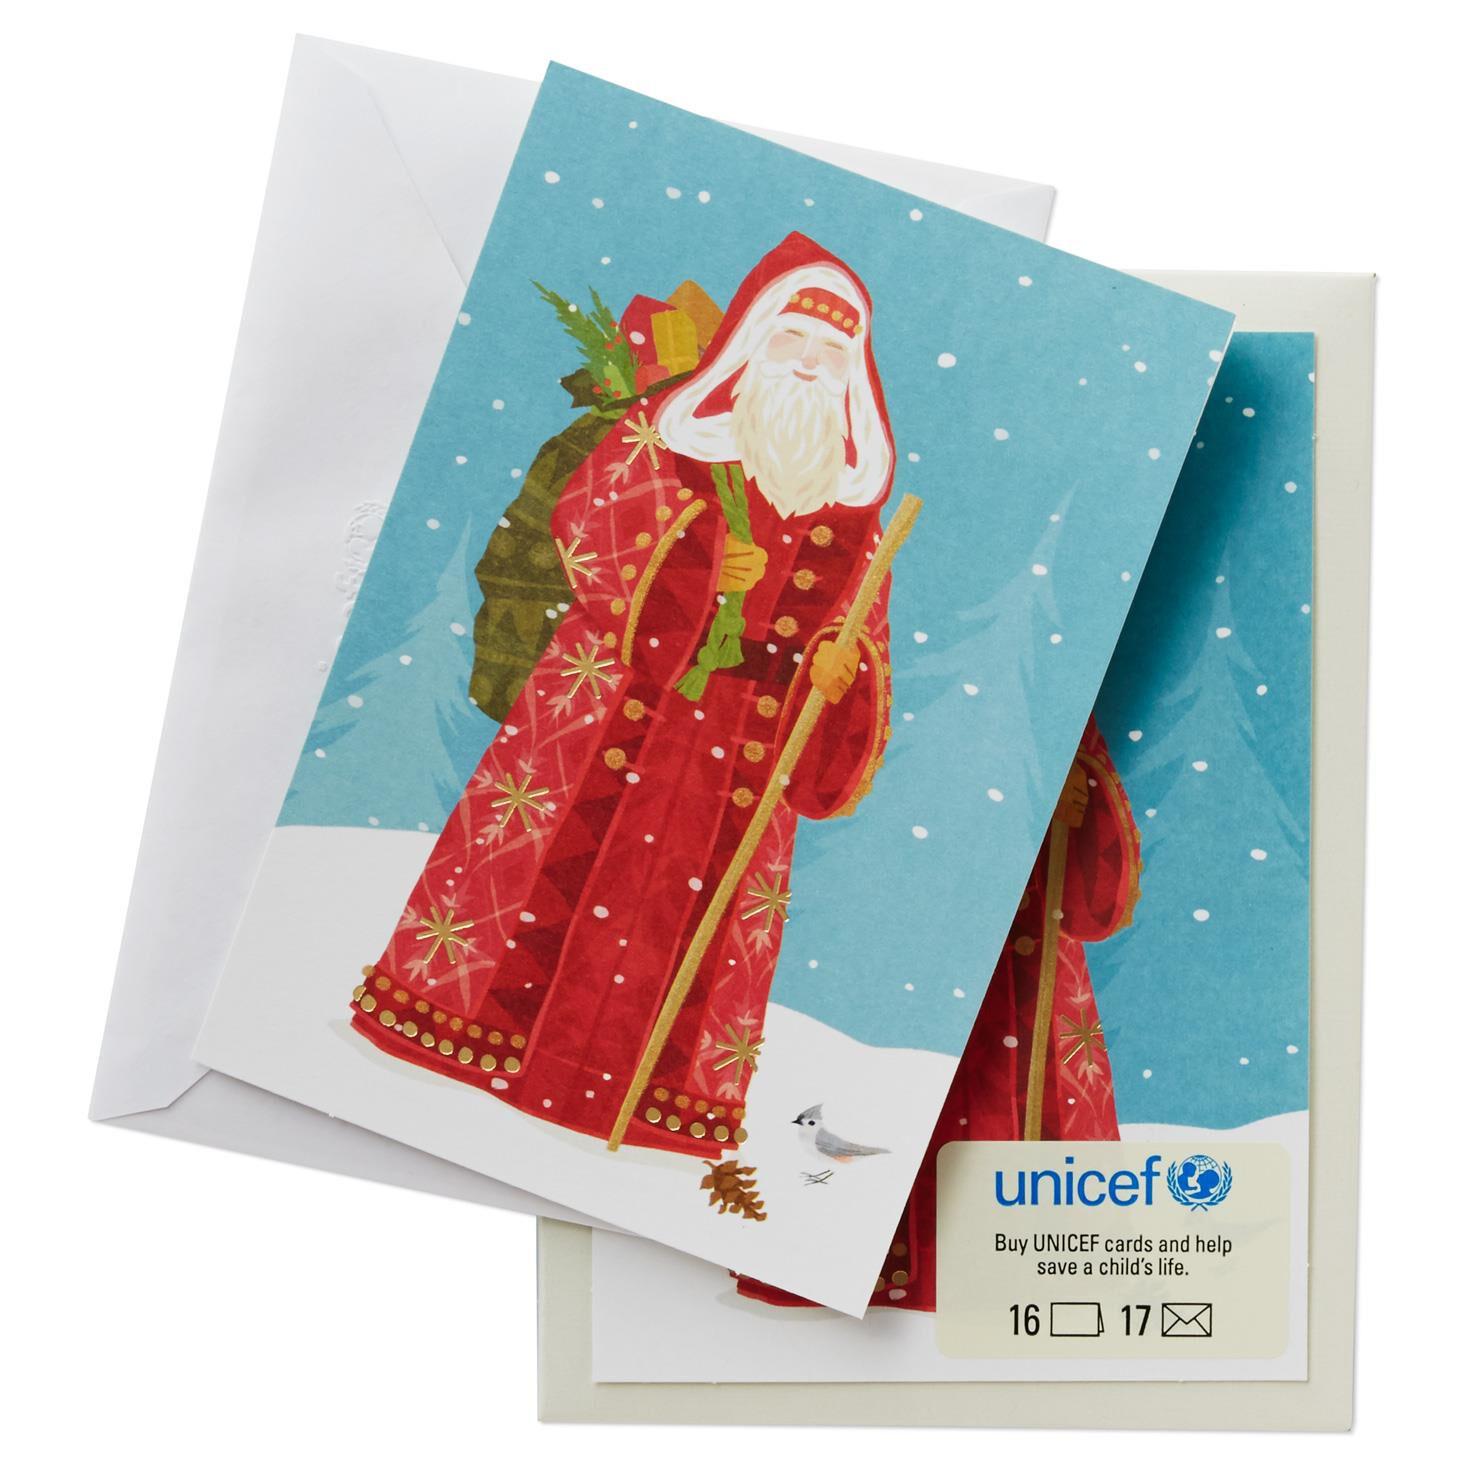 UNICEF European Santa Claus Christmas Cards, Box of 16 - Boxed ...